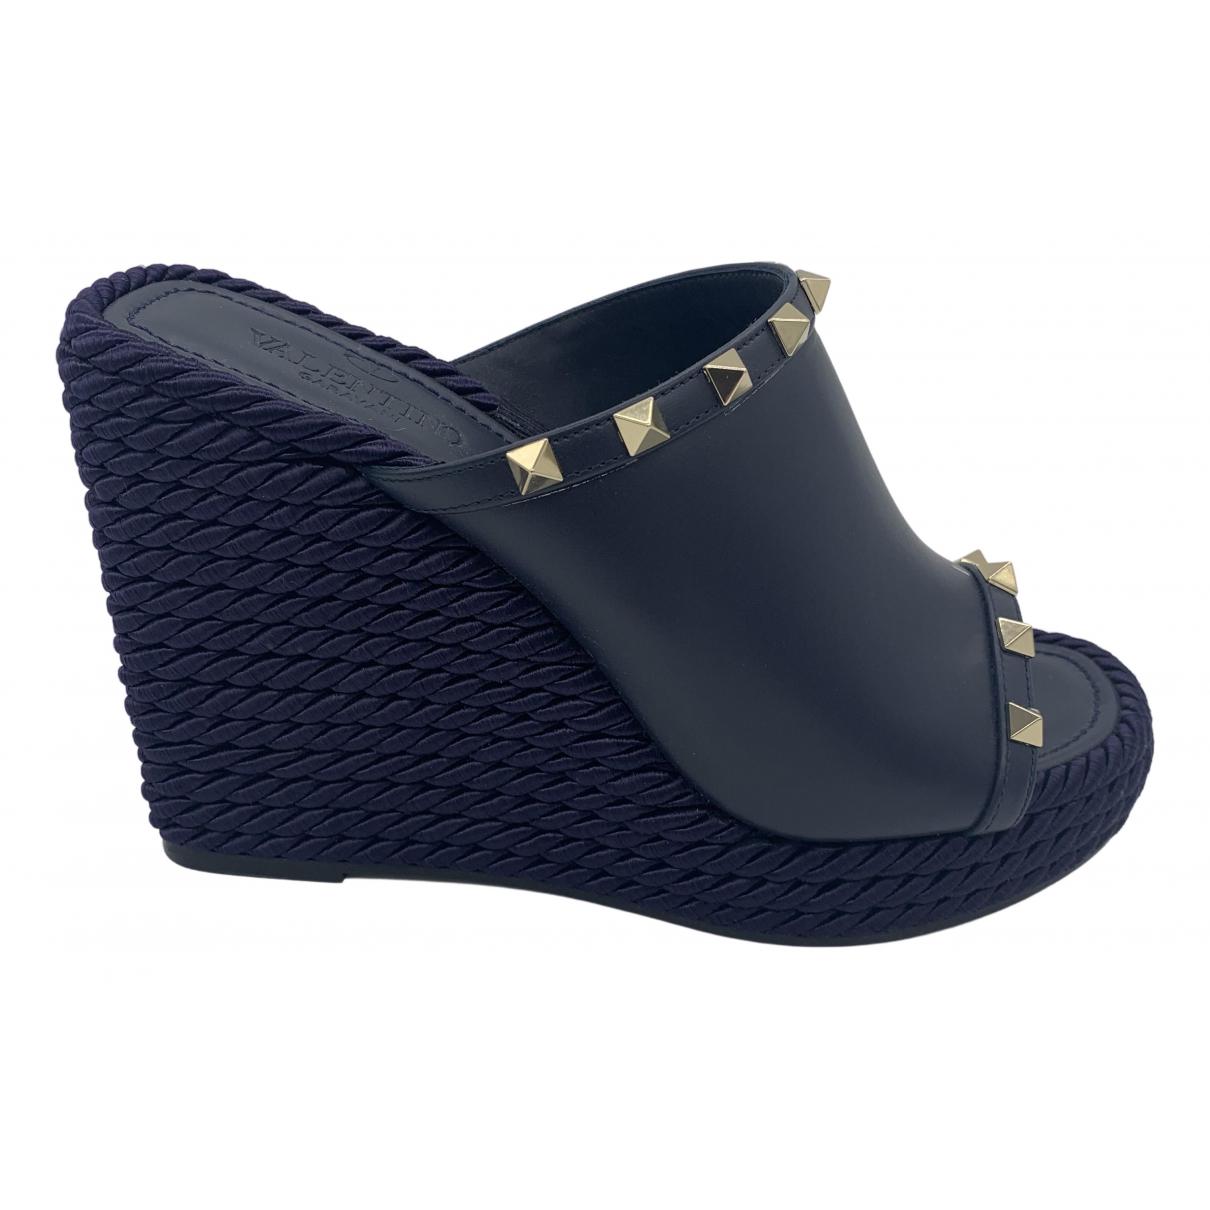 Valentino Garavani \N Blue Leather Sandals for Women 39 EU